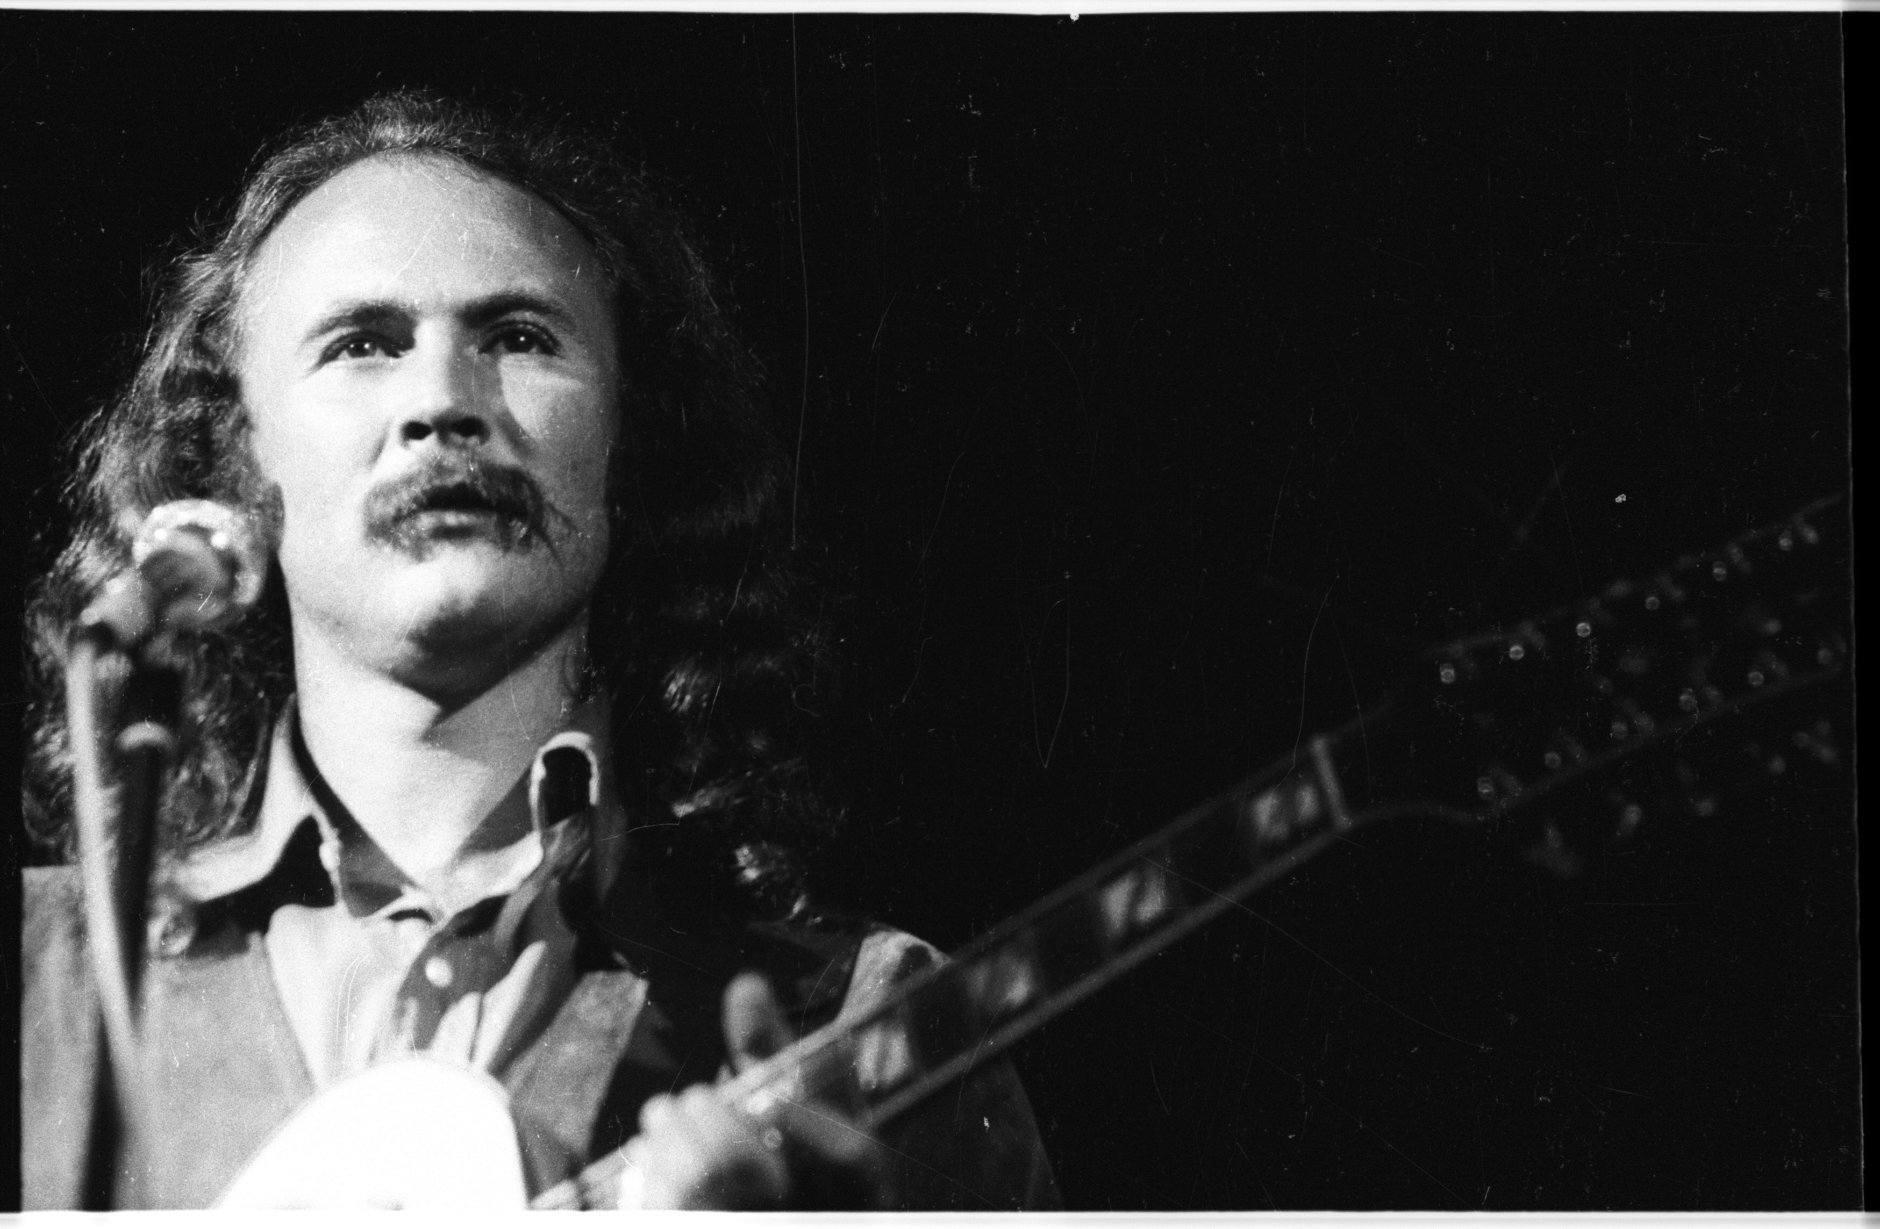 David Crosby at Woodstock